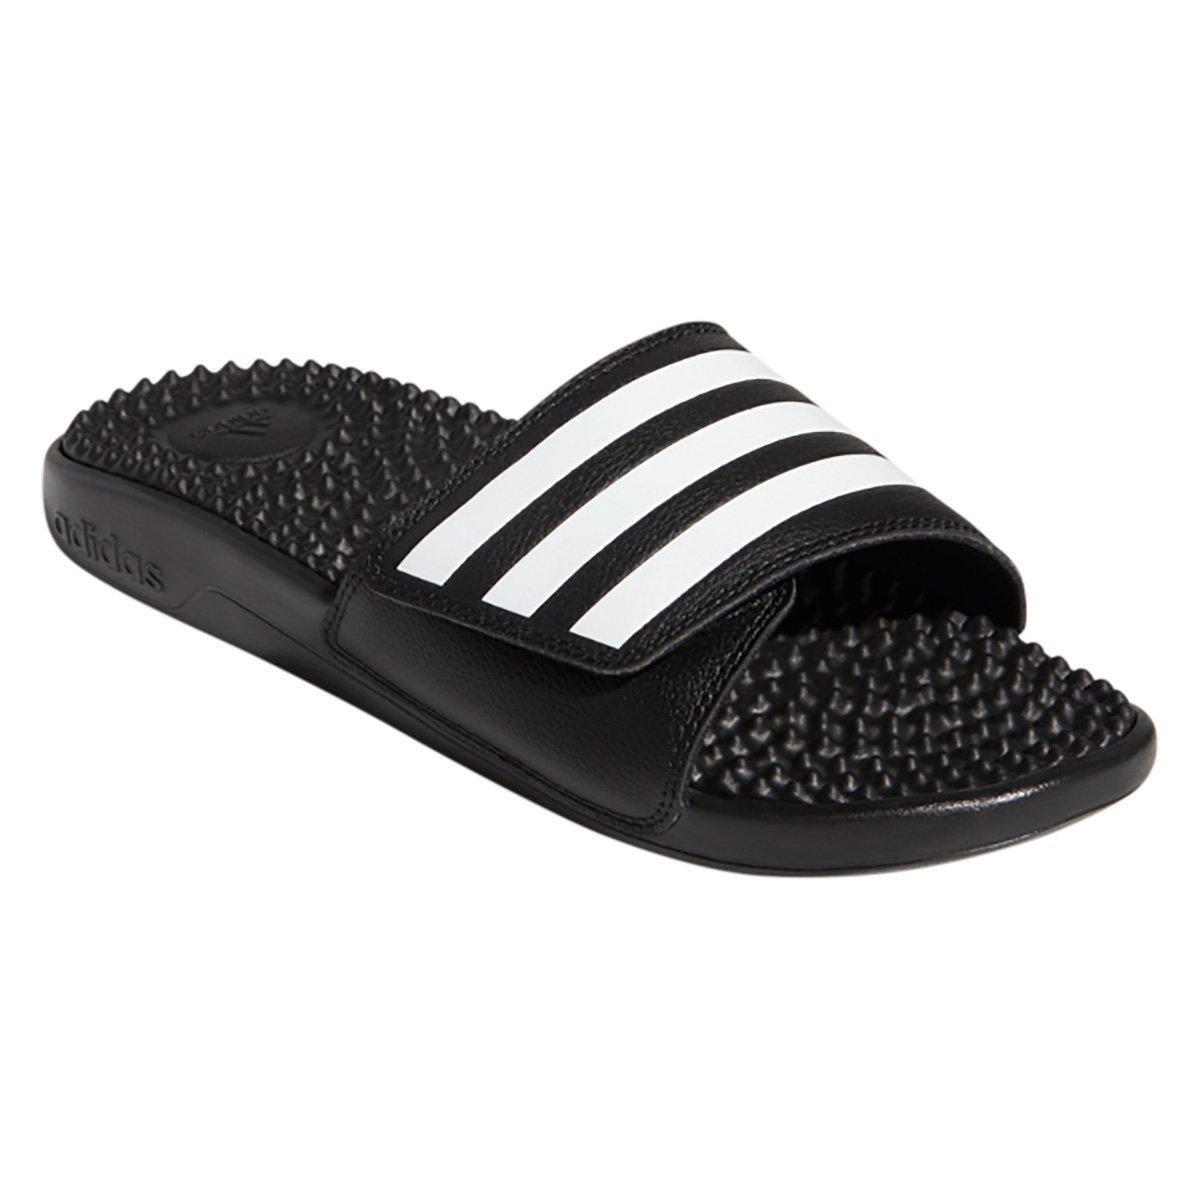 Chinelo Adidas Slide Adissage - Preto e Branco